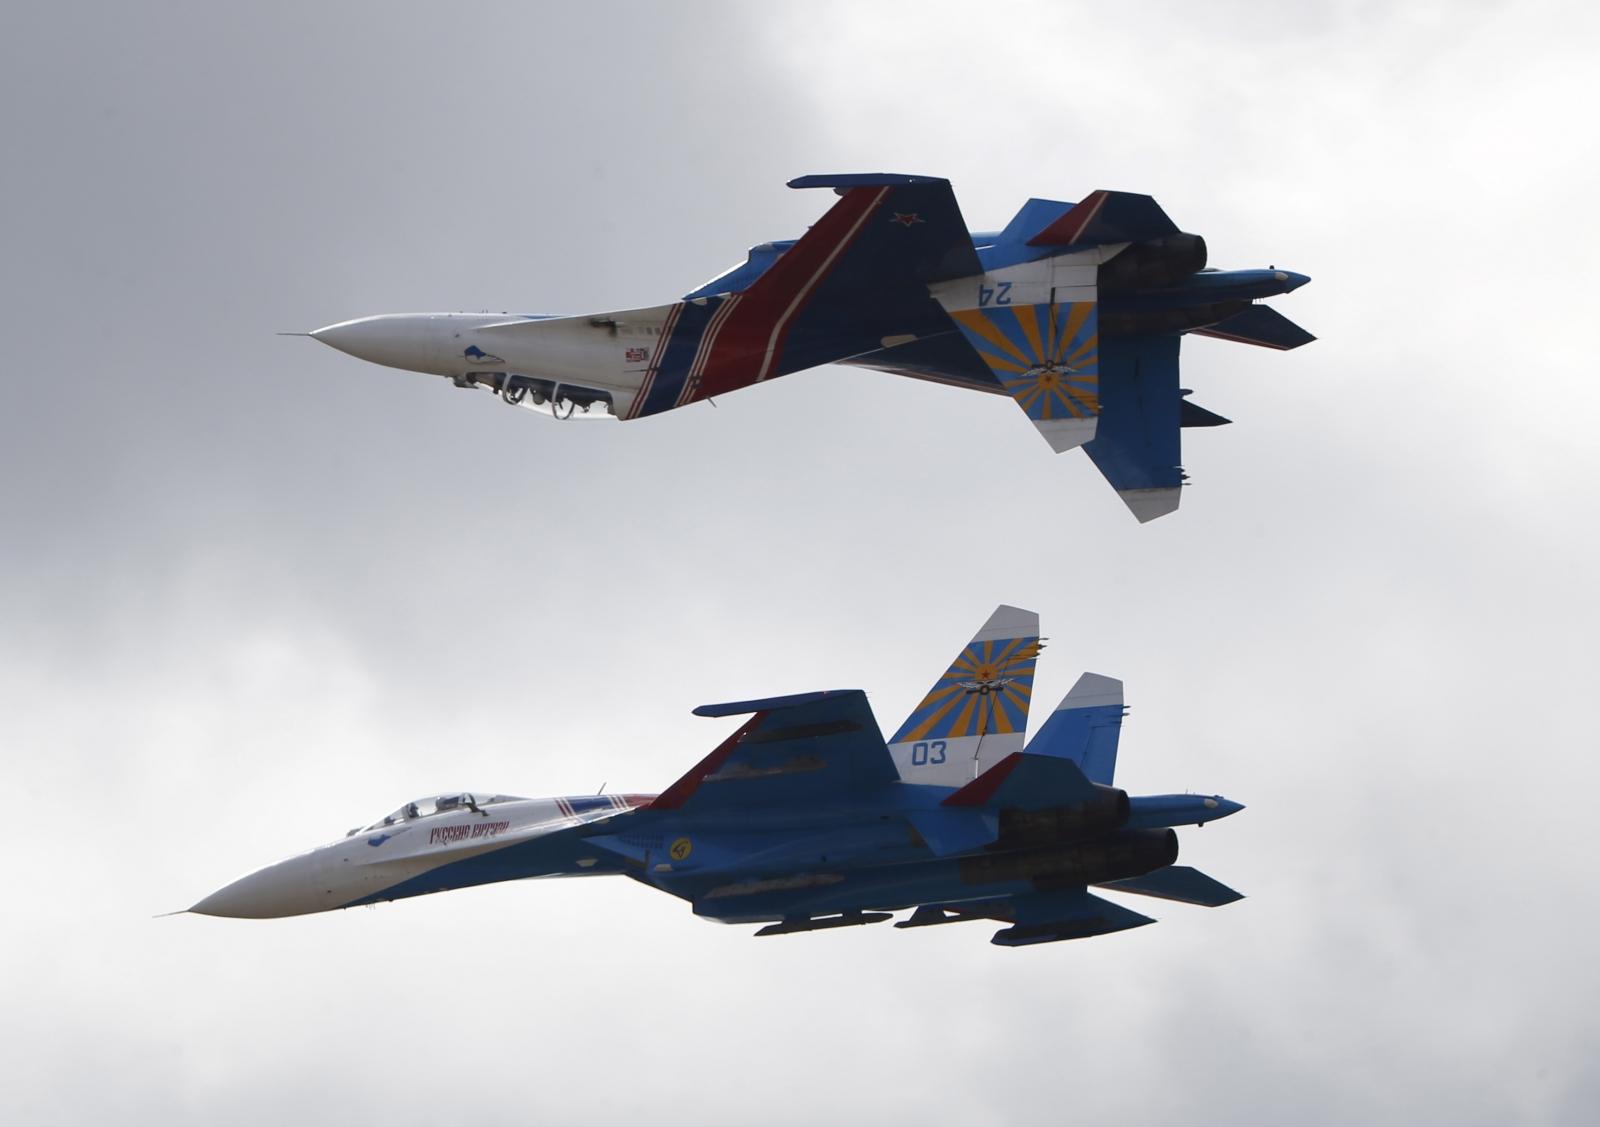 Russian jet intercepted over Baltic Sea